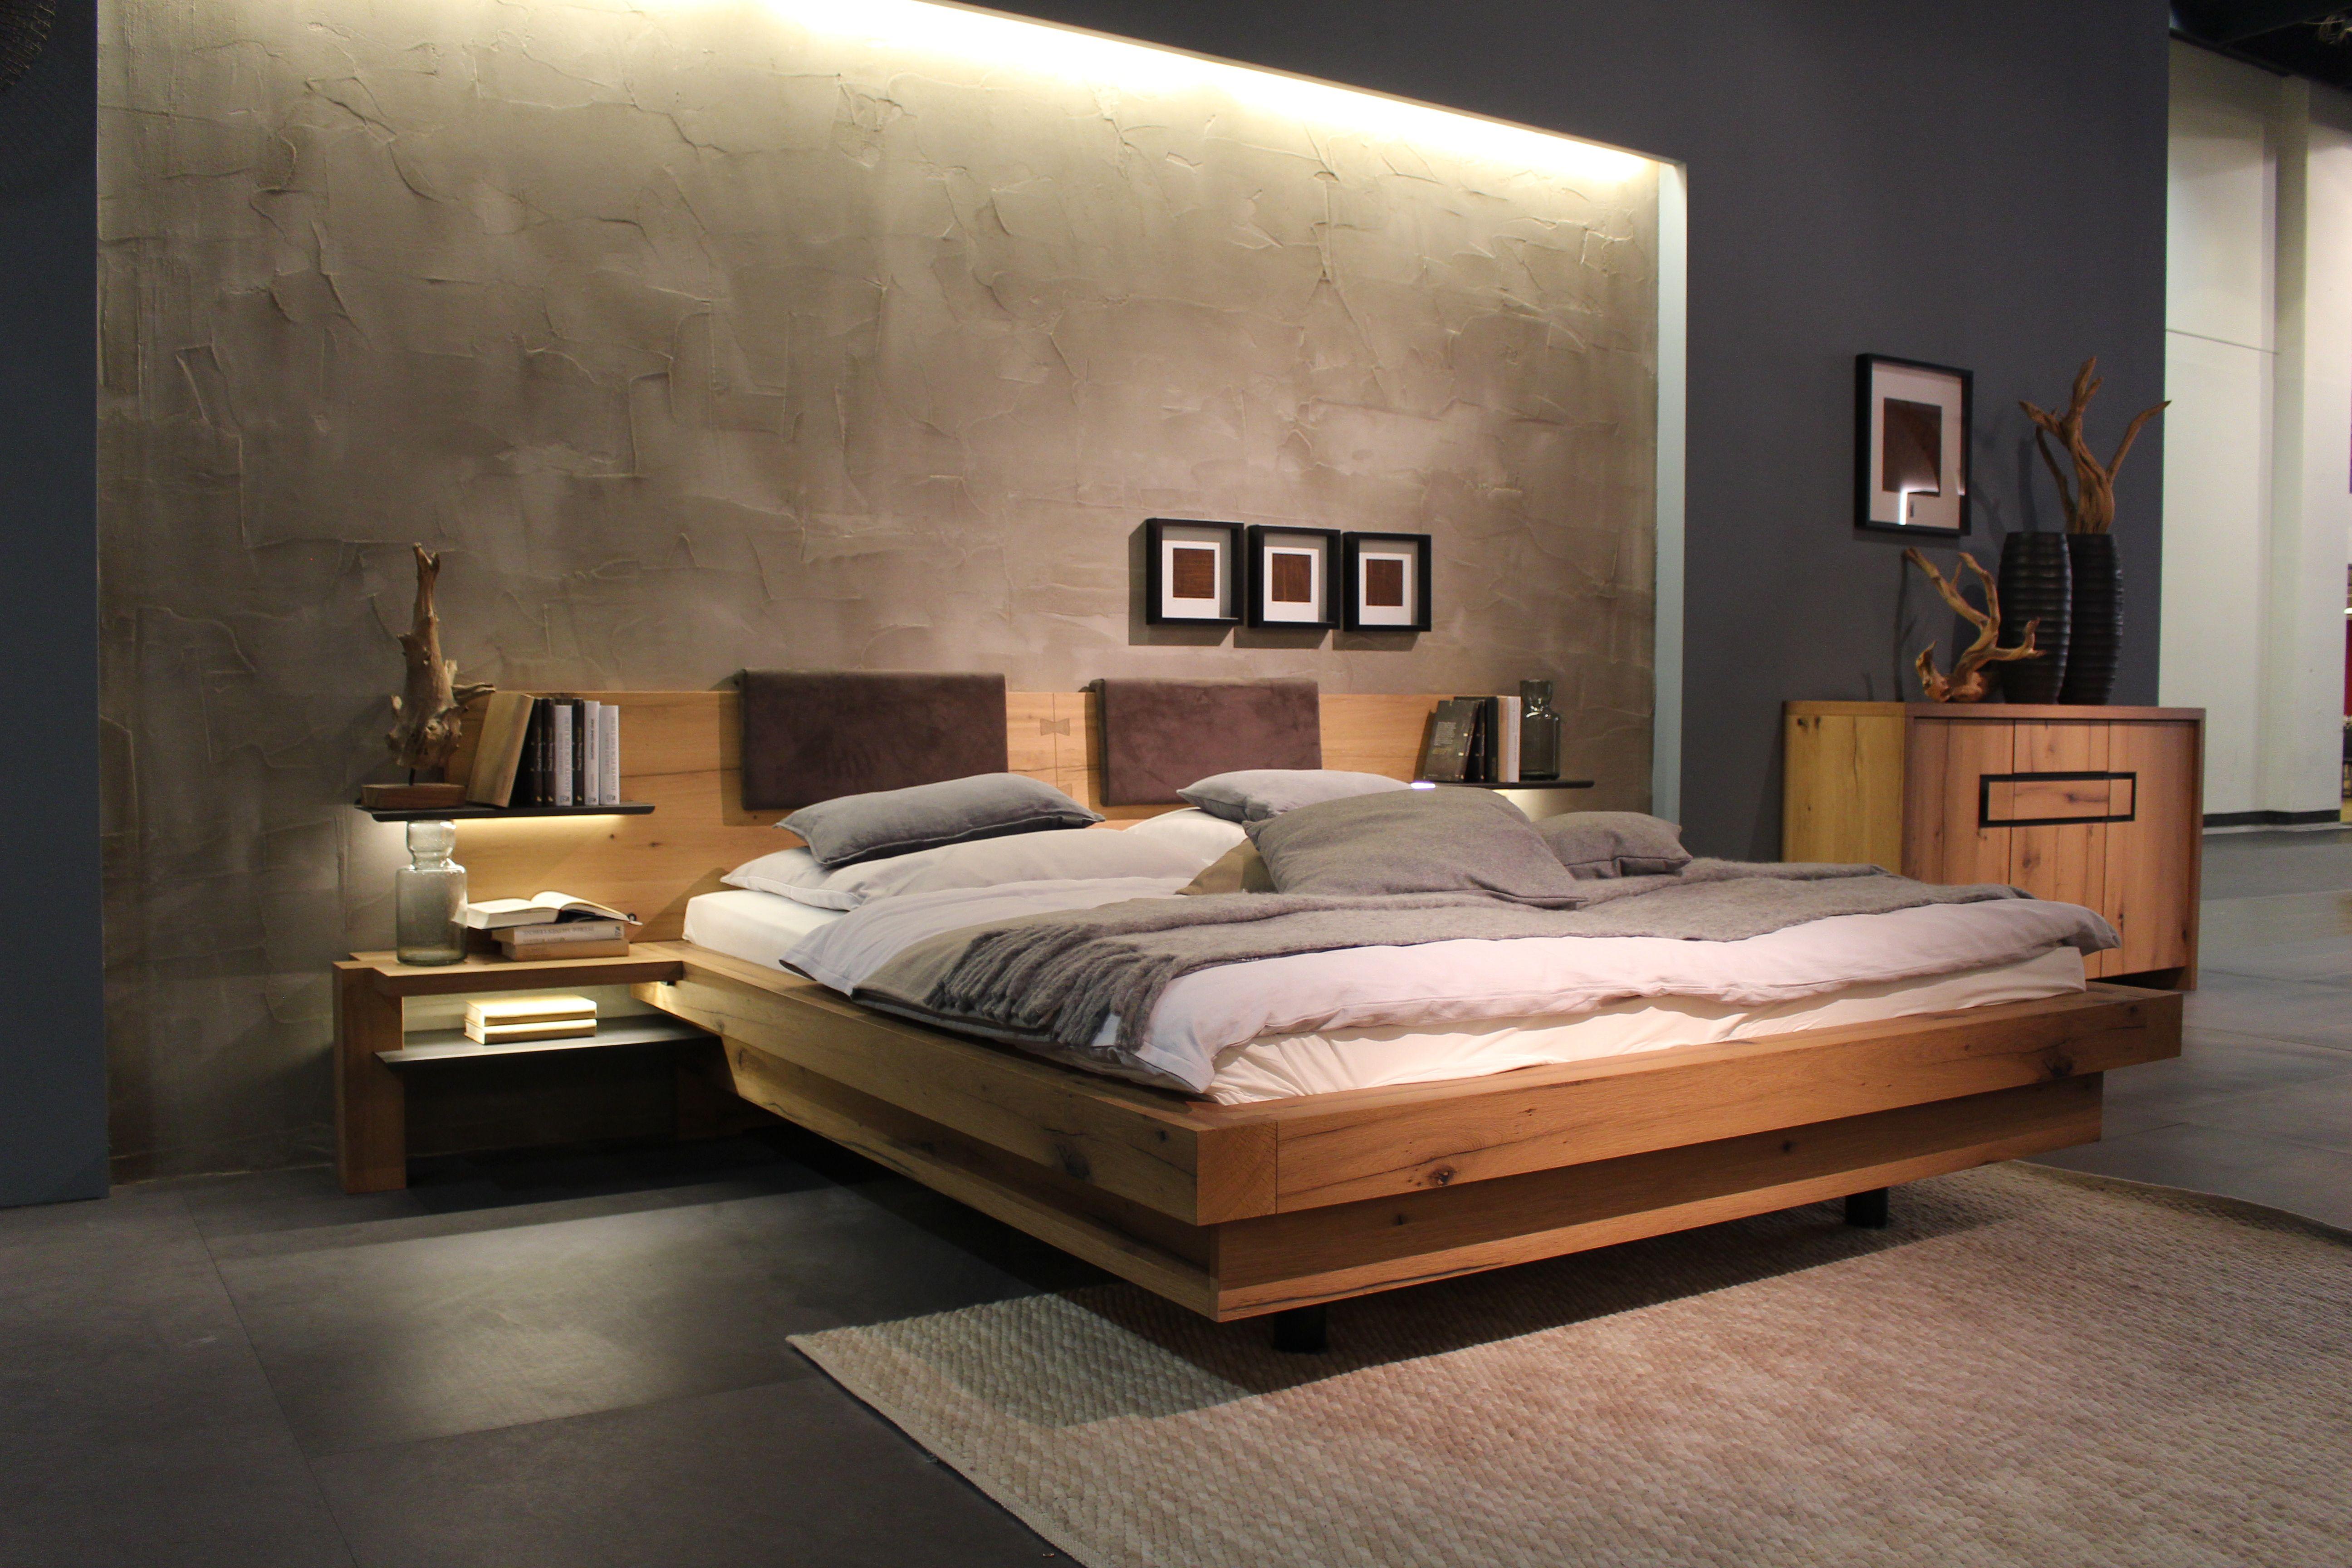 M Belmesse K Ln, Wohntrends, Living, Regal, Massivholzregal, Schlafzimmer, Bett,